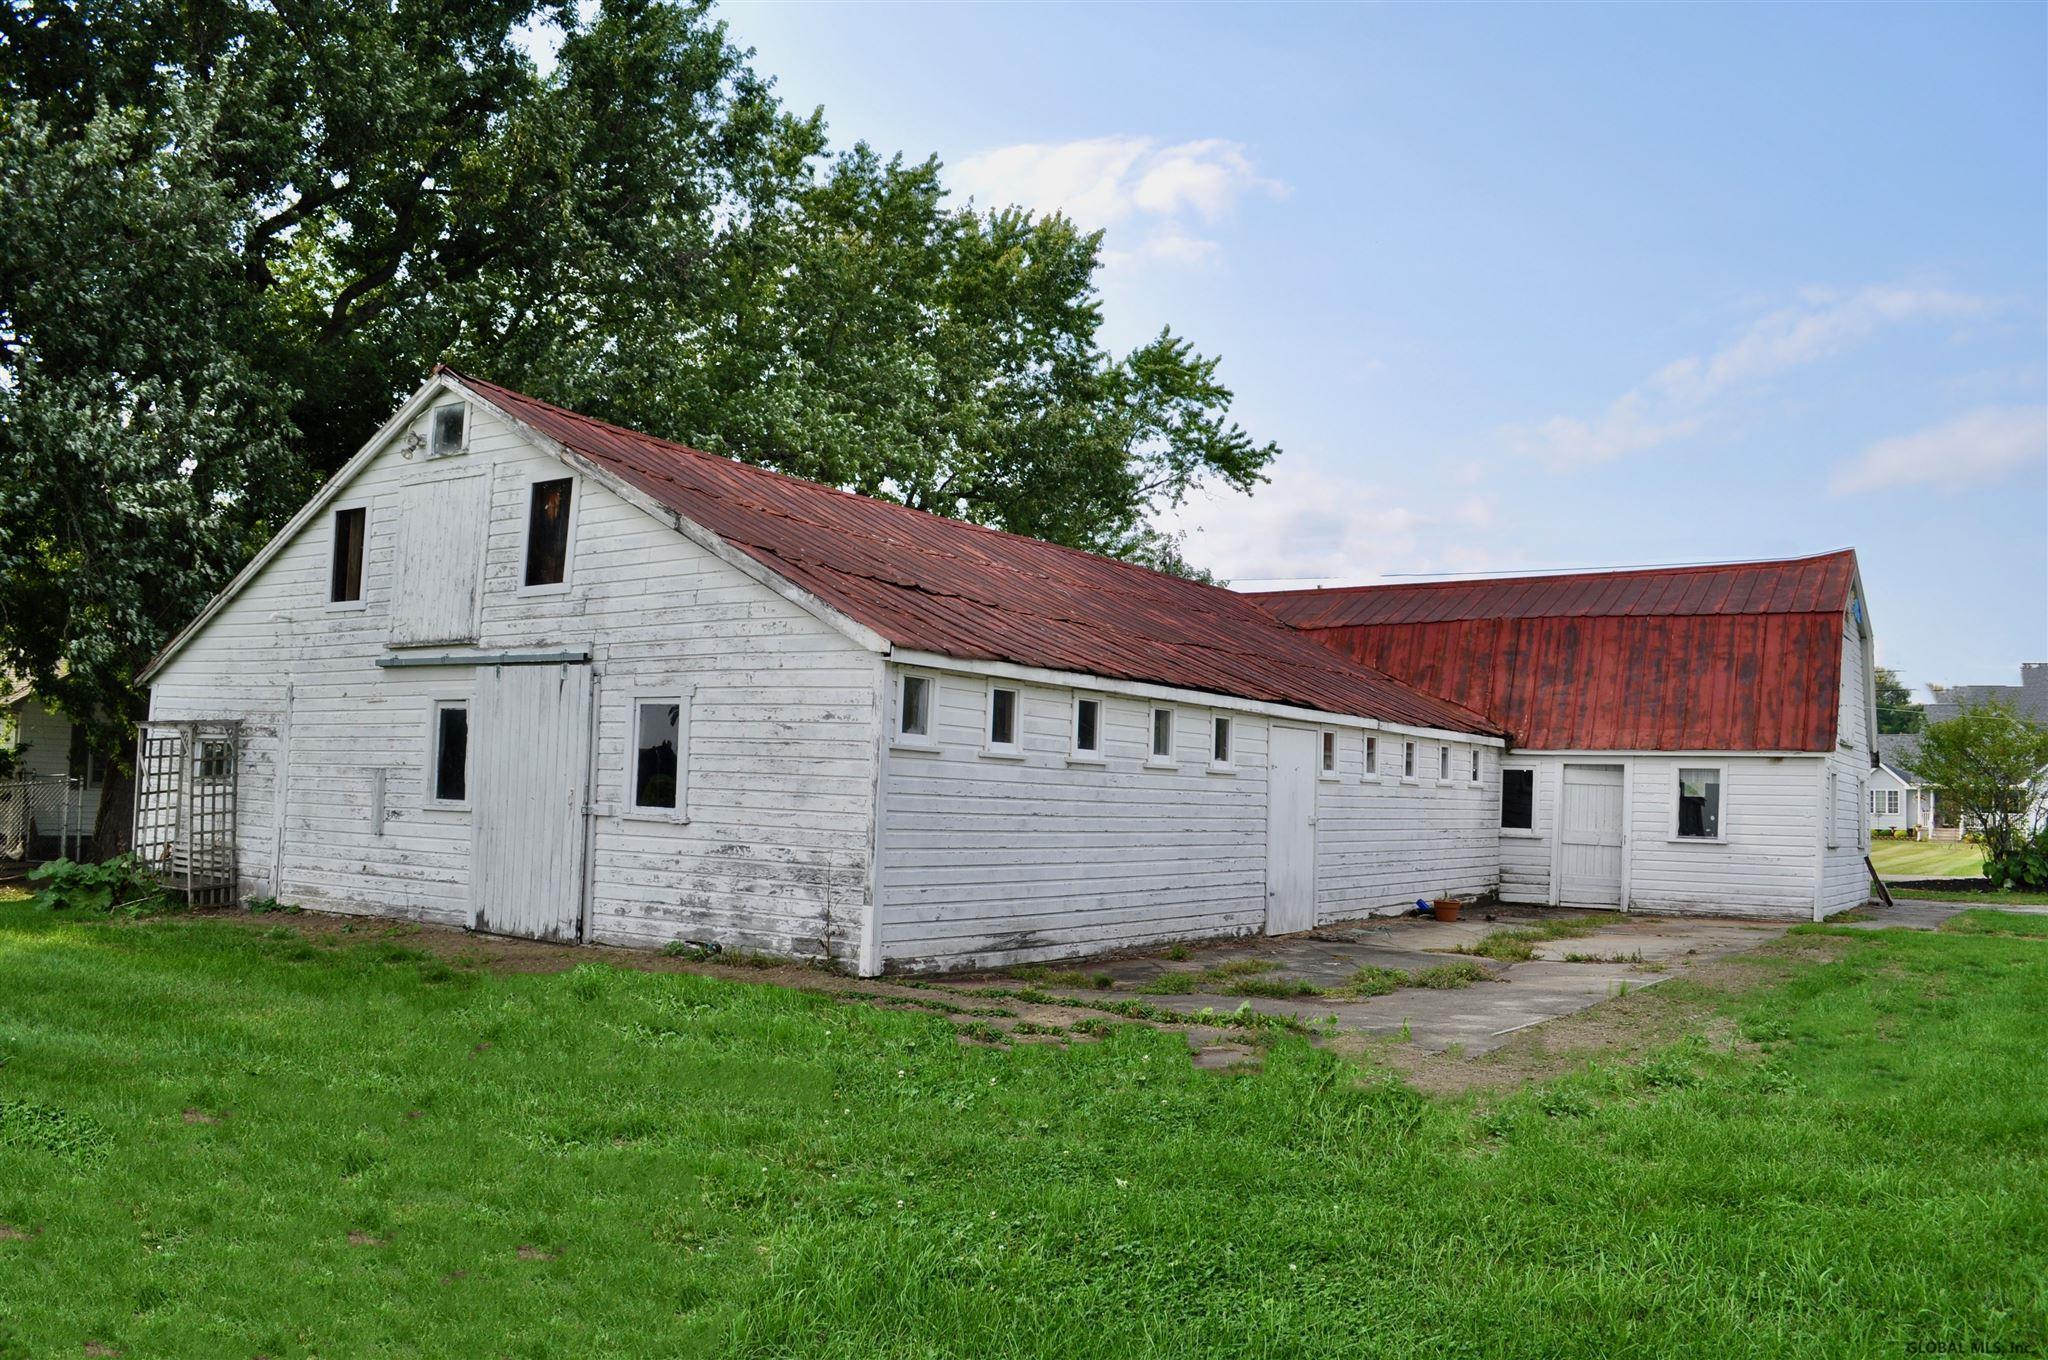 Johnstown image 90